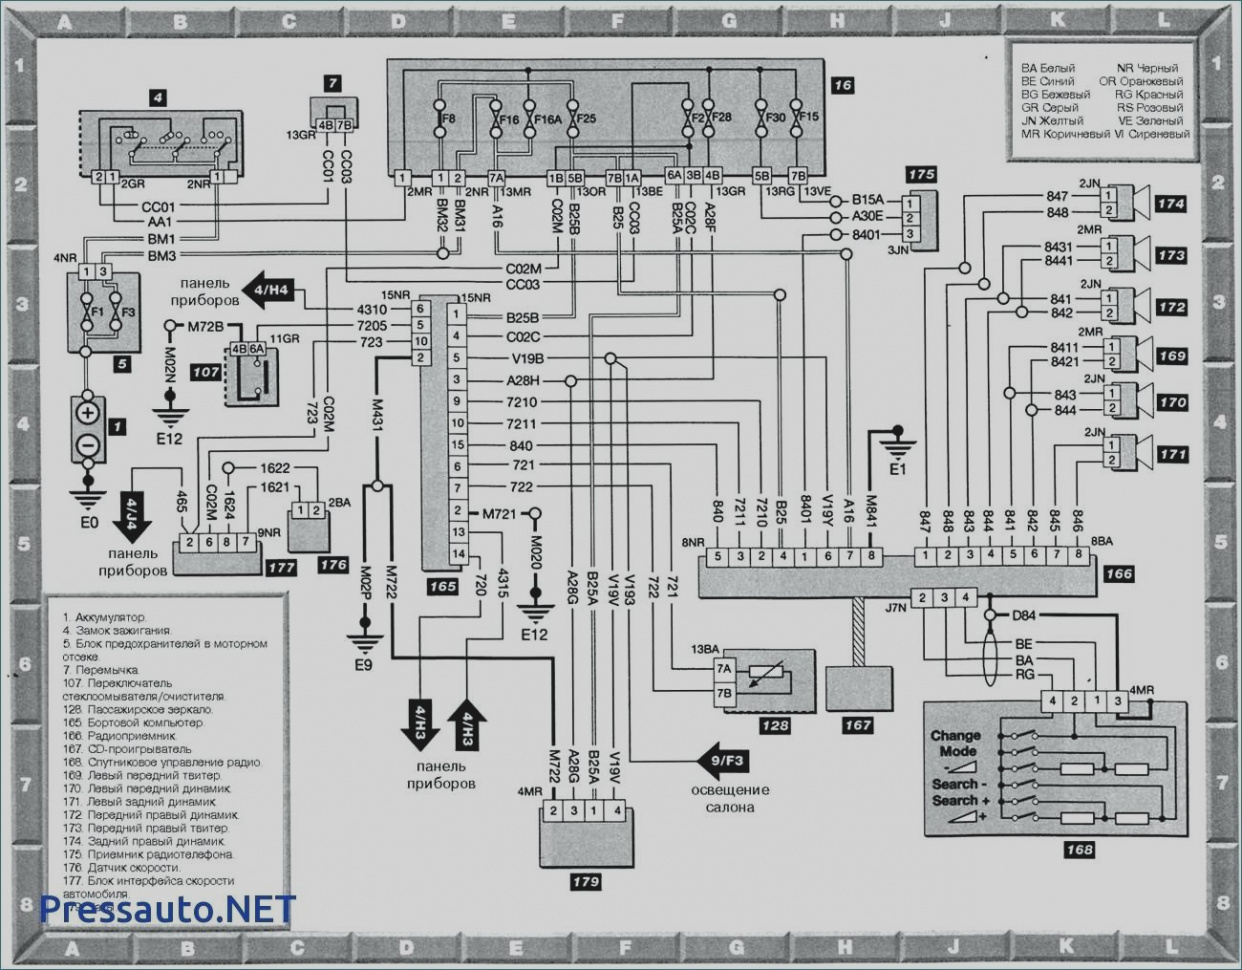 peugeot 306 wiring diagram central locking peugeot 307 horn wiring diagram wiring diagram data  peugeot 307 horn wiring diagram